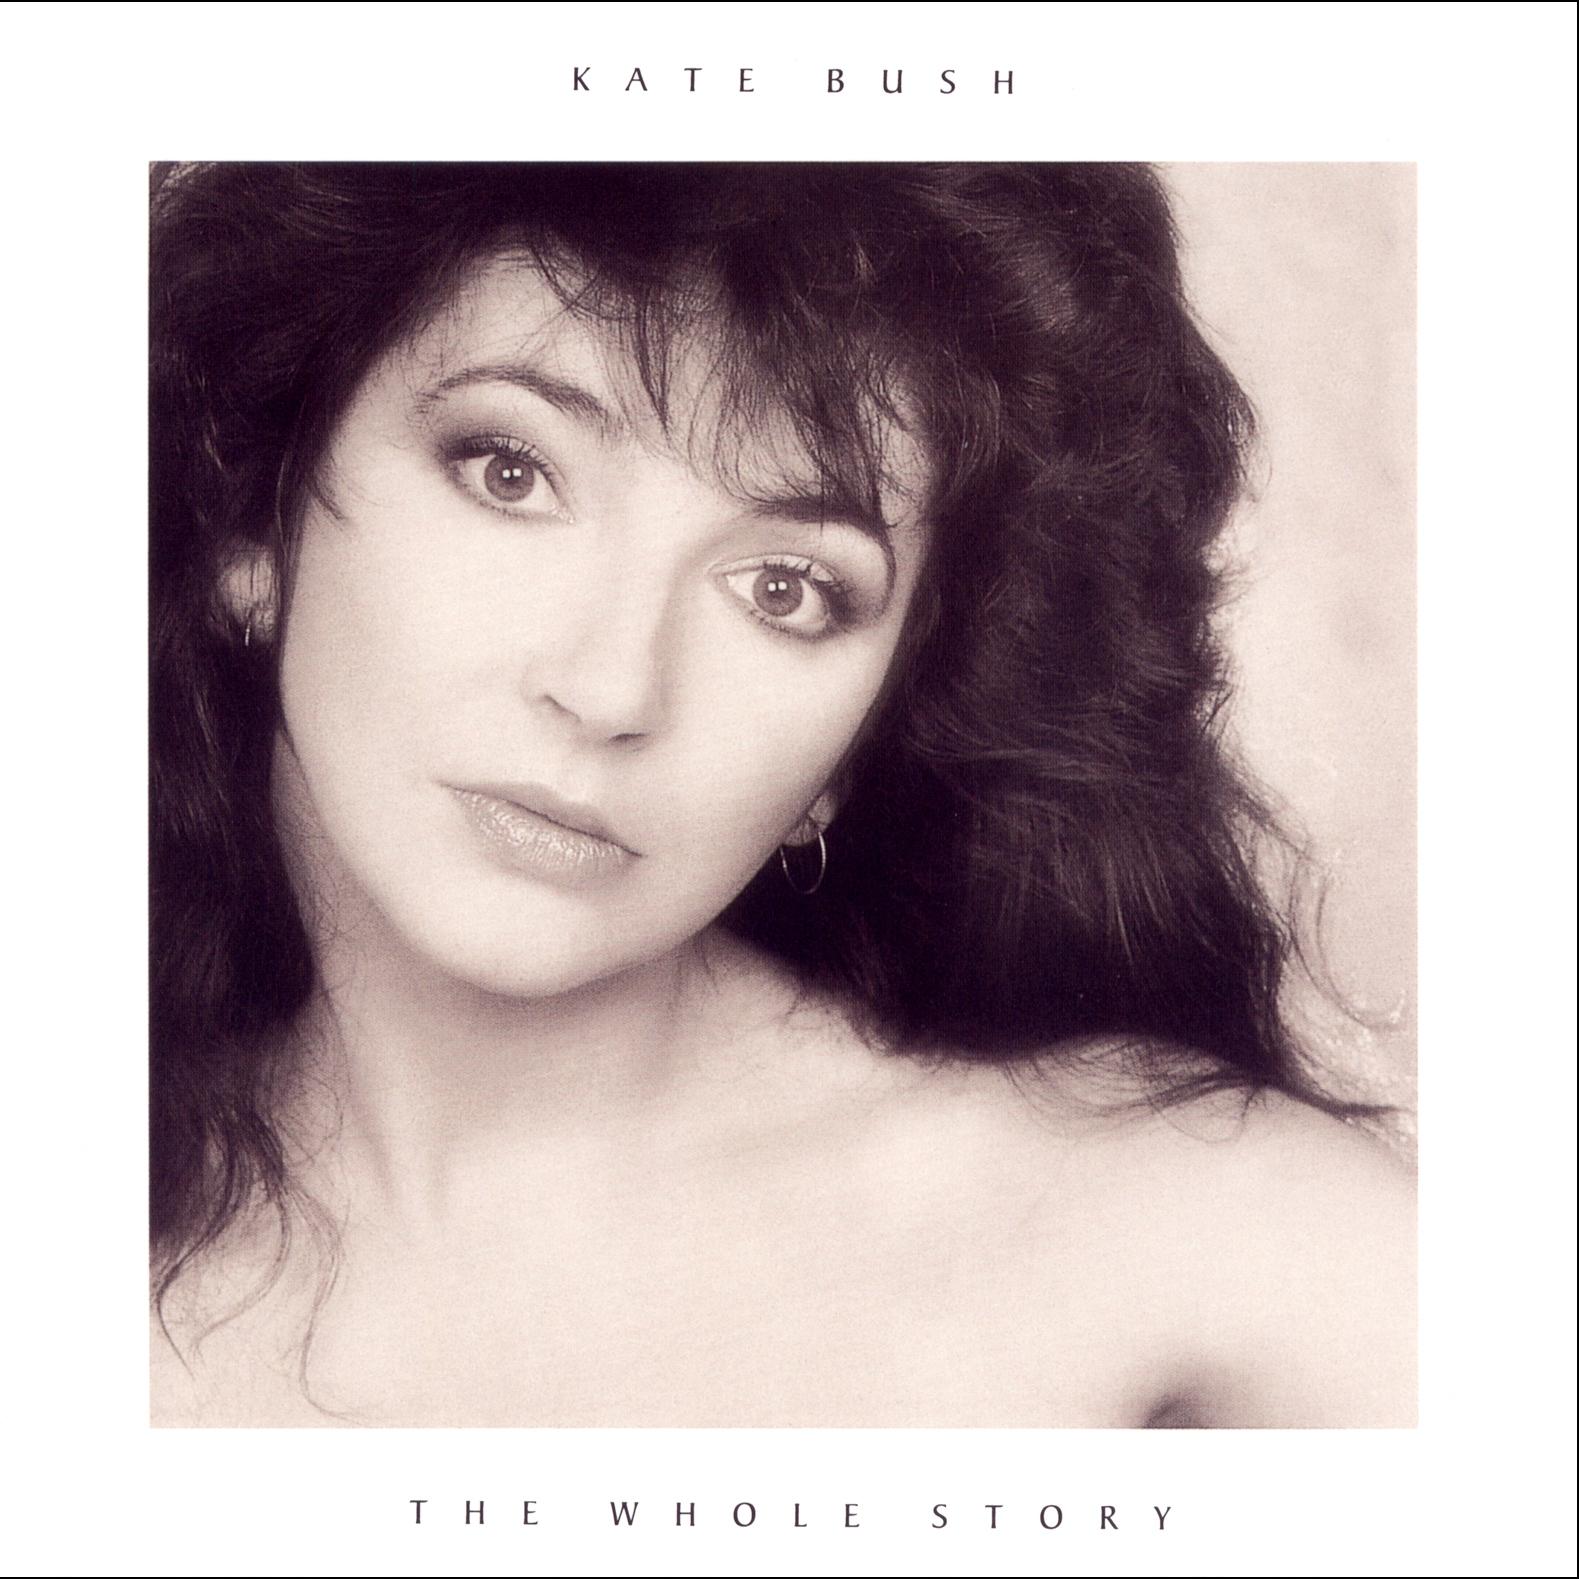 Kate bush the whole story album